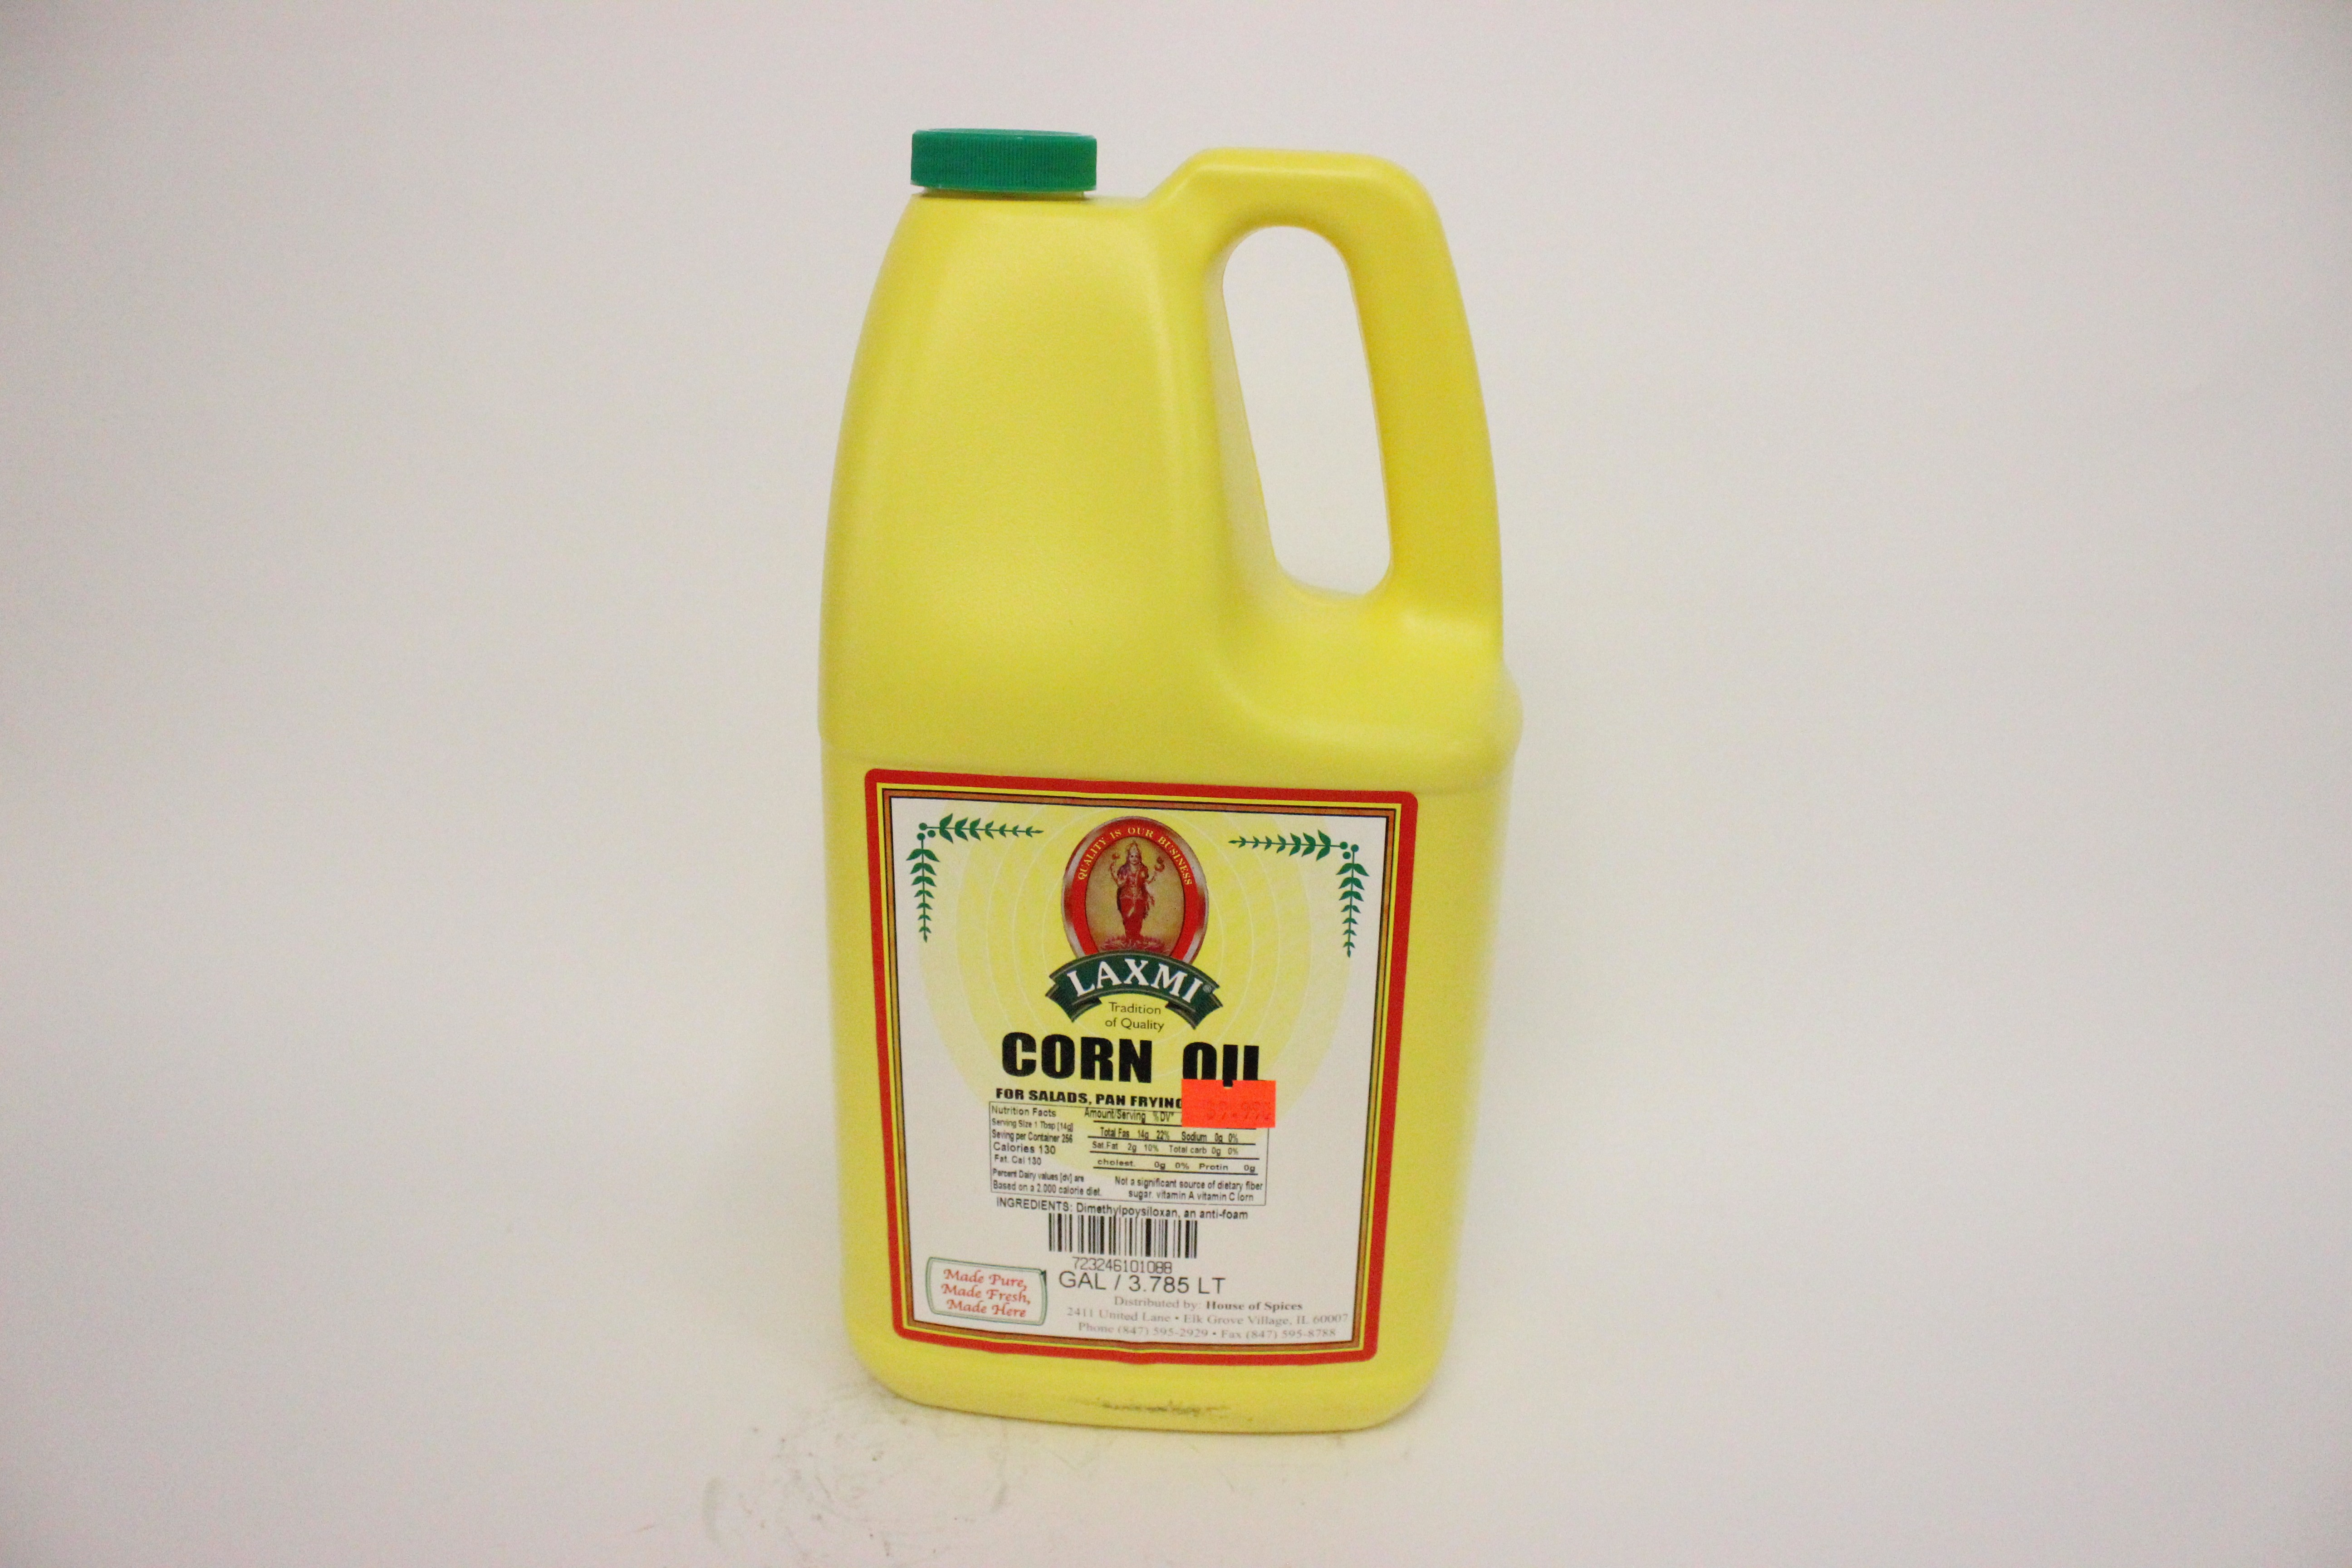 Corn Oil 1 Gal